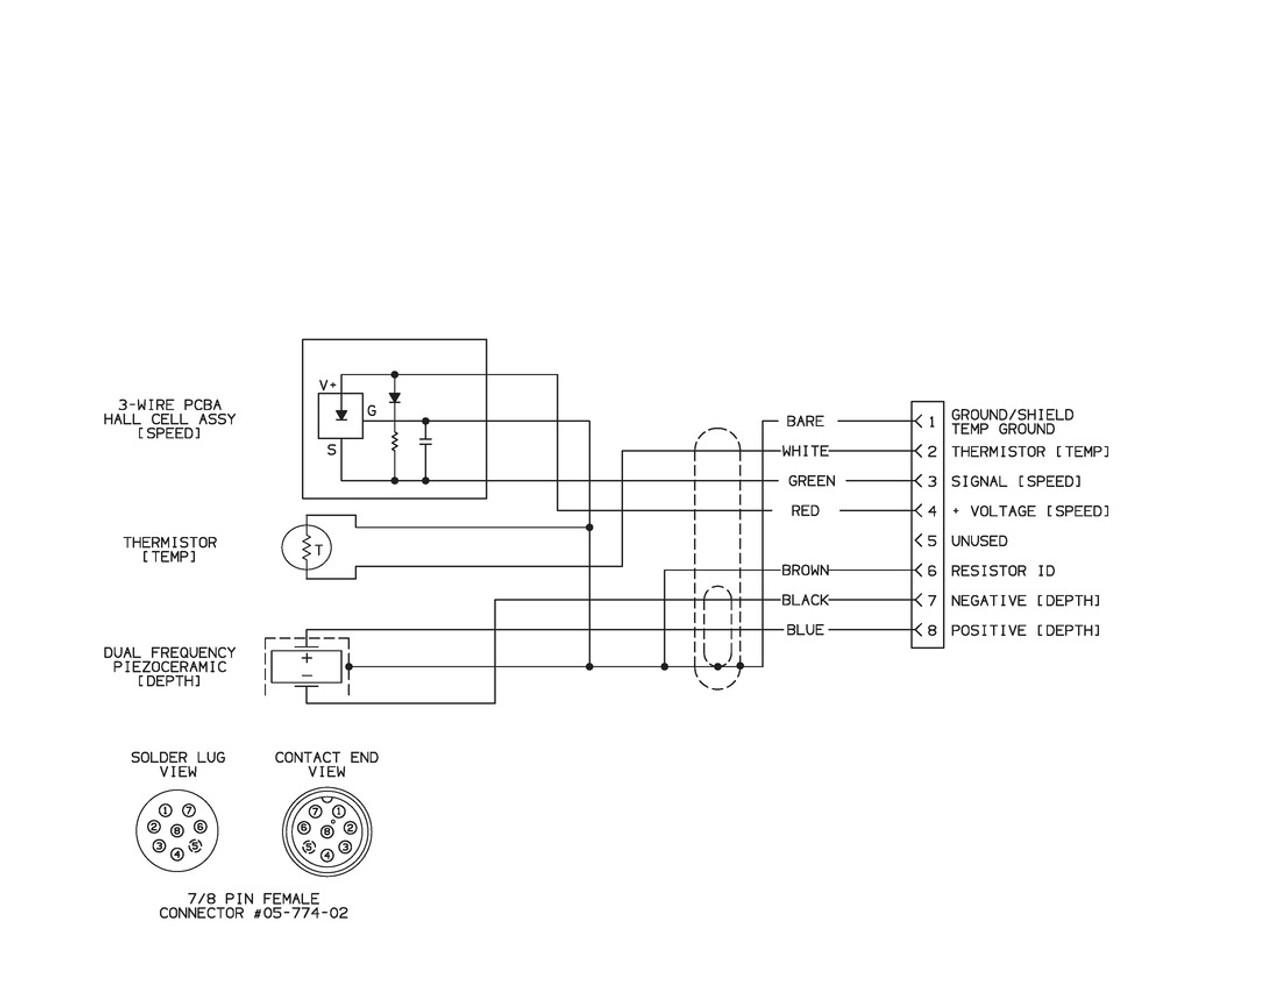 medium resolution of wrg 2785 thermistor wiring diagram dualdepth speed u0026 temperature p66 600w transducers with